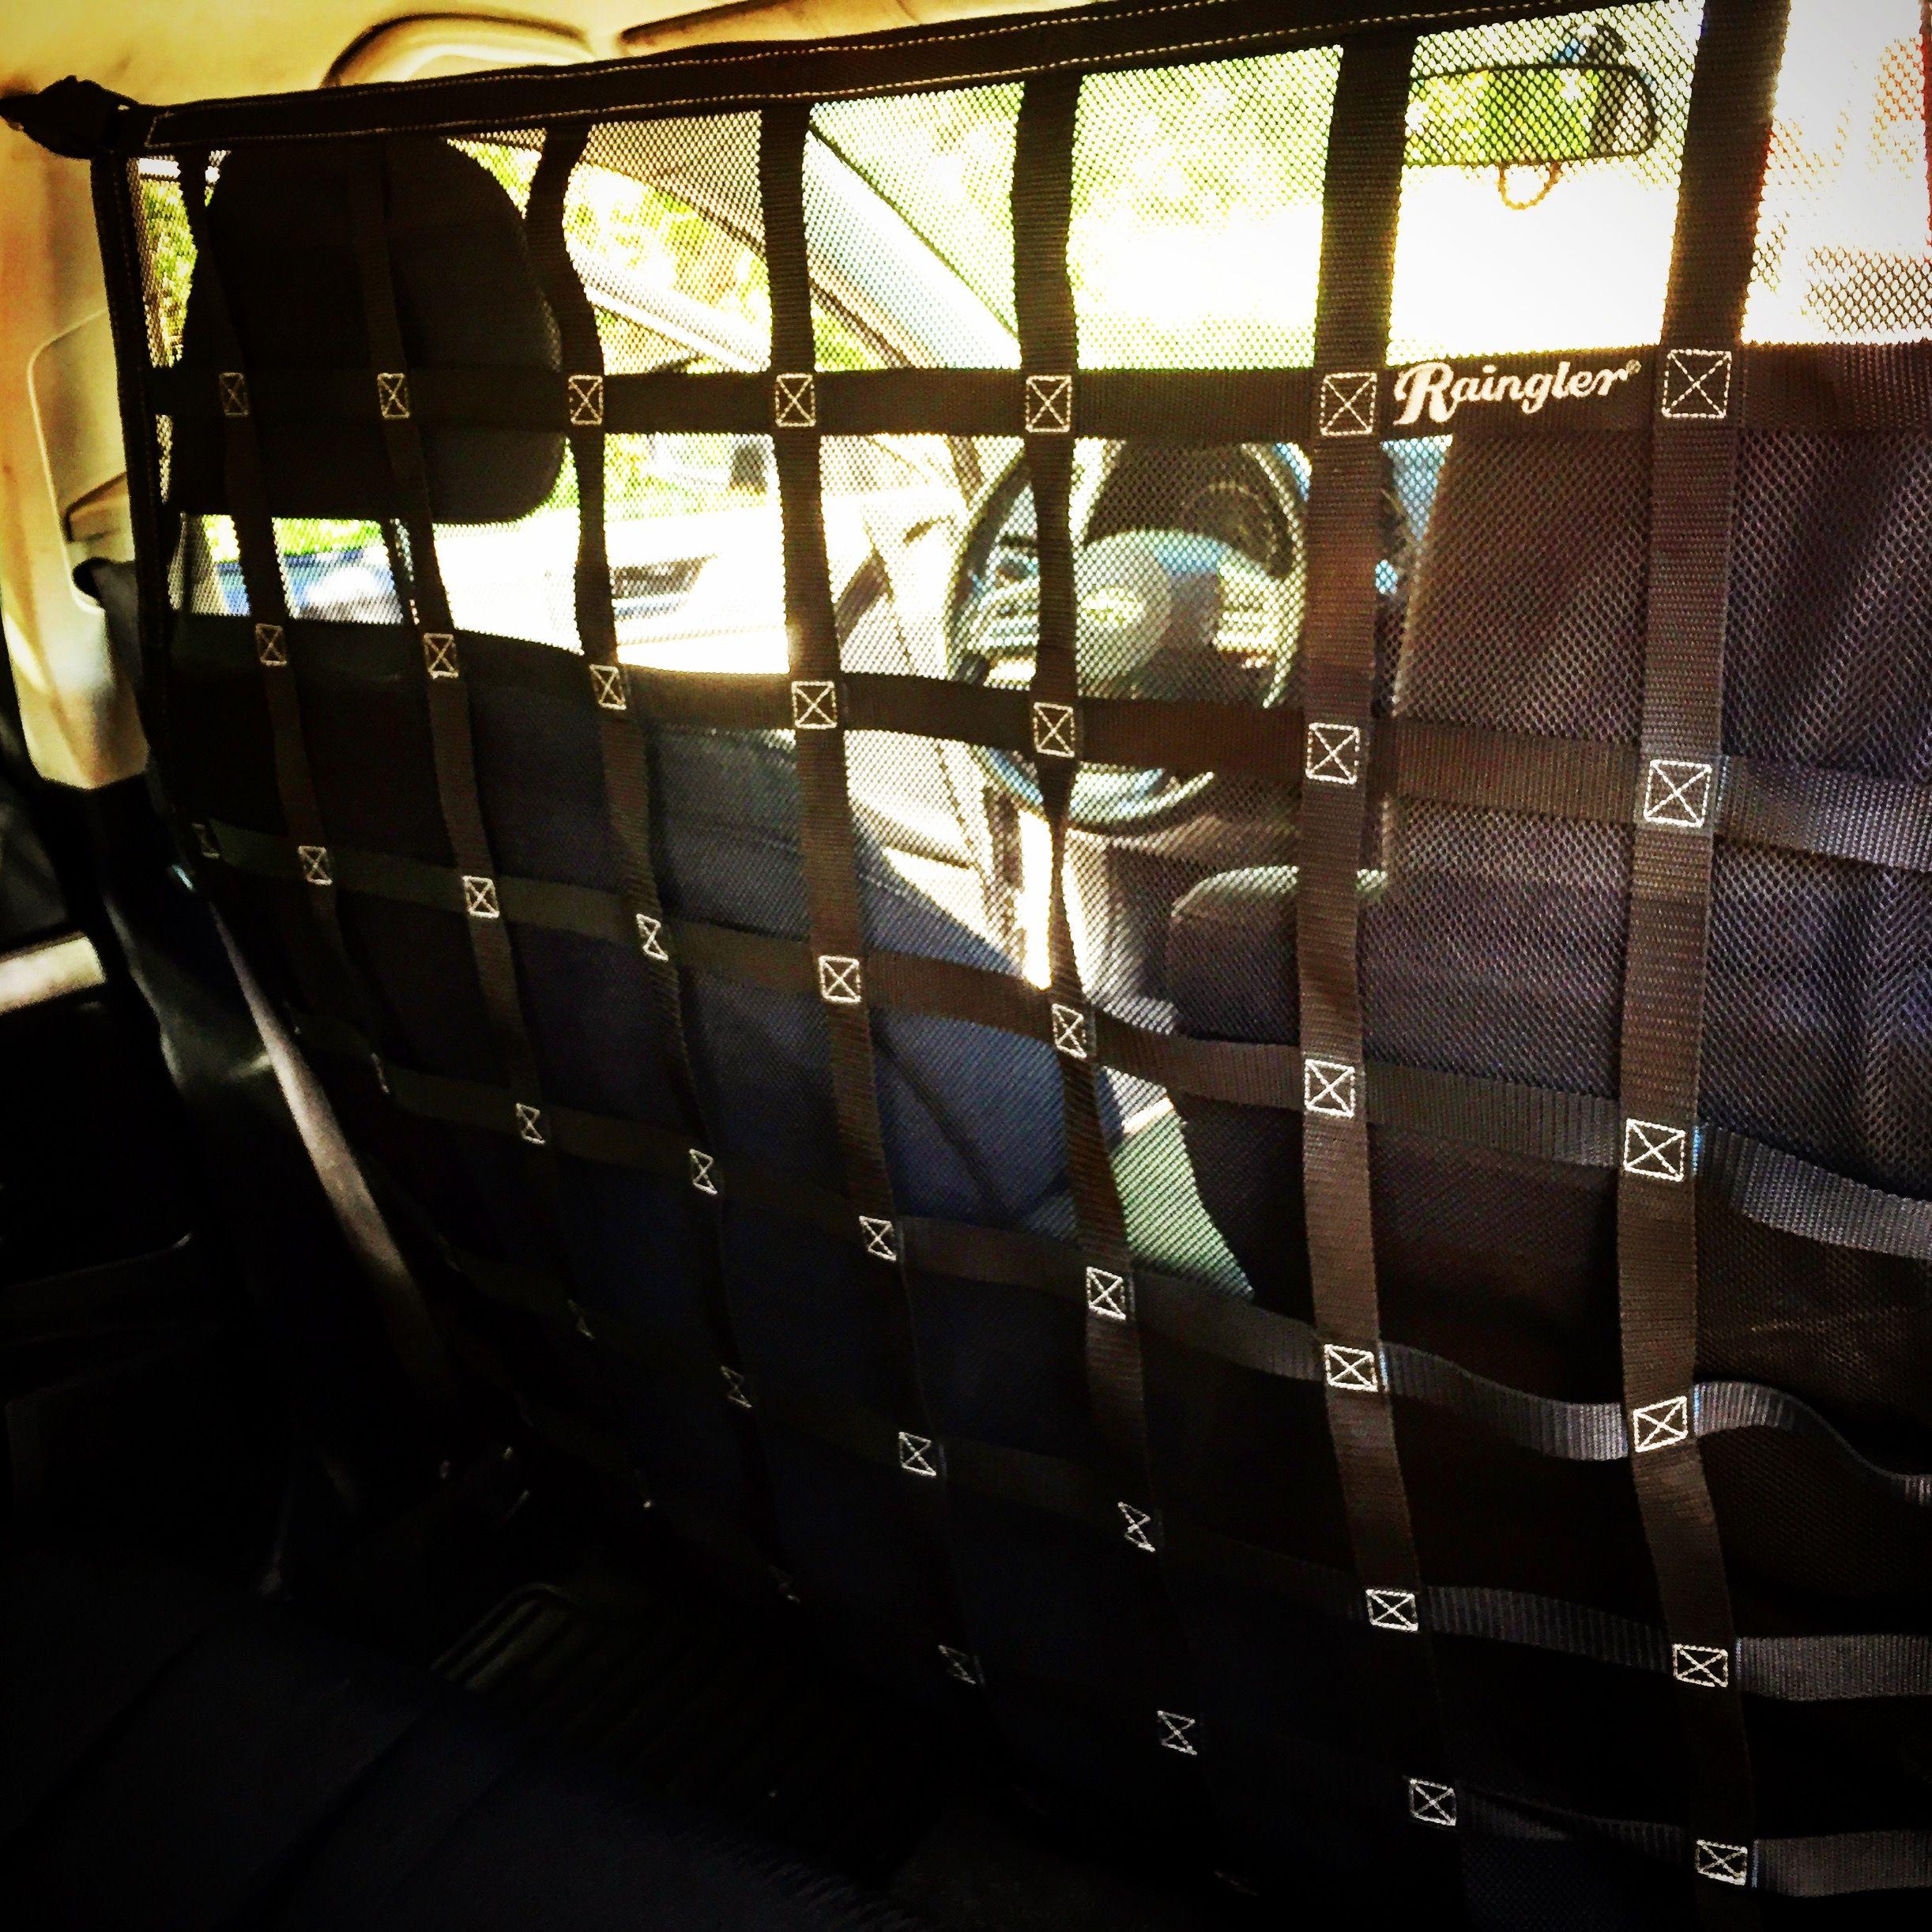 One of the behind seat barriers for #subaru #subaruoutbacK #subarucrosstrek #subaruimpreza #subarugear #raingler #CARGONETS #subarulove #dogsandcars  #subaruporn #subaruoffroad #dogsandcars #handmadeisbetter #madeintheusa #madeinamerica #madeincolorado #builttolast by #RAINGLERNETS